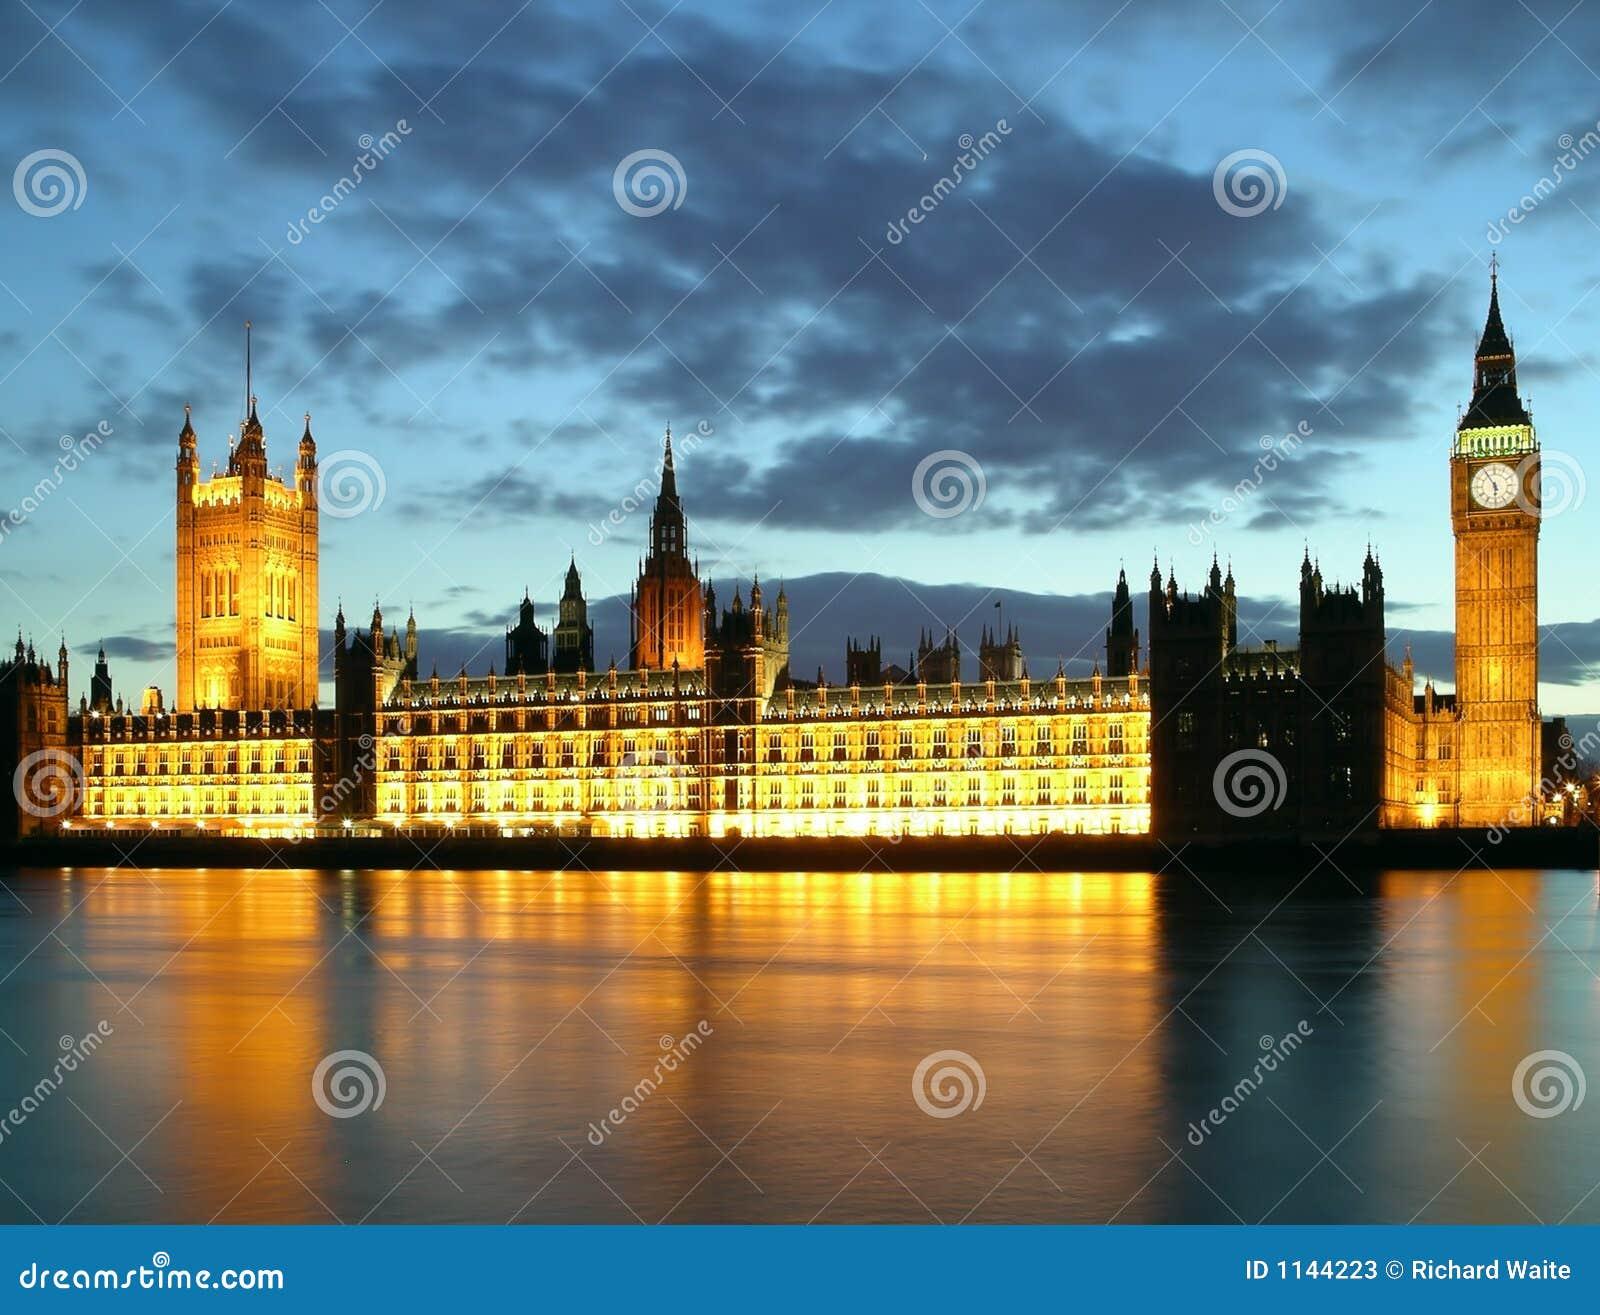 grand ben et maisons du parlement la nuit image stock. Black Bedroom Furniture Sets. Home Design Ideas